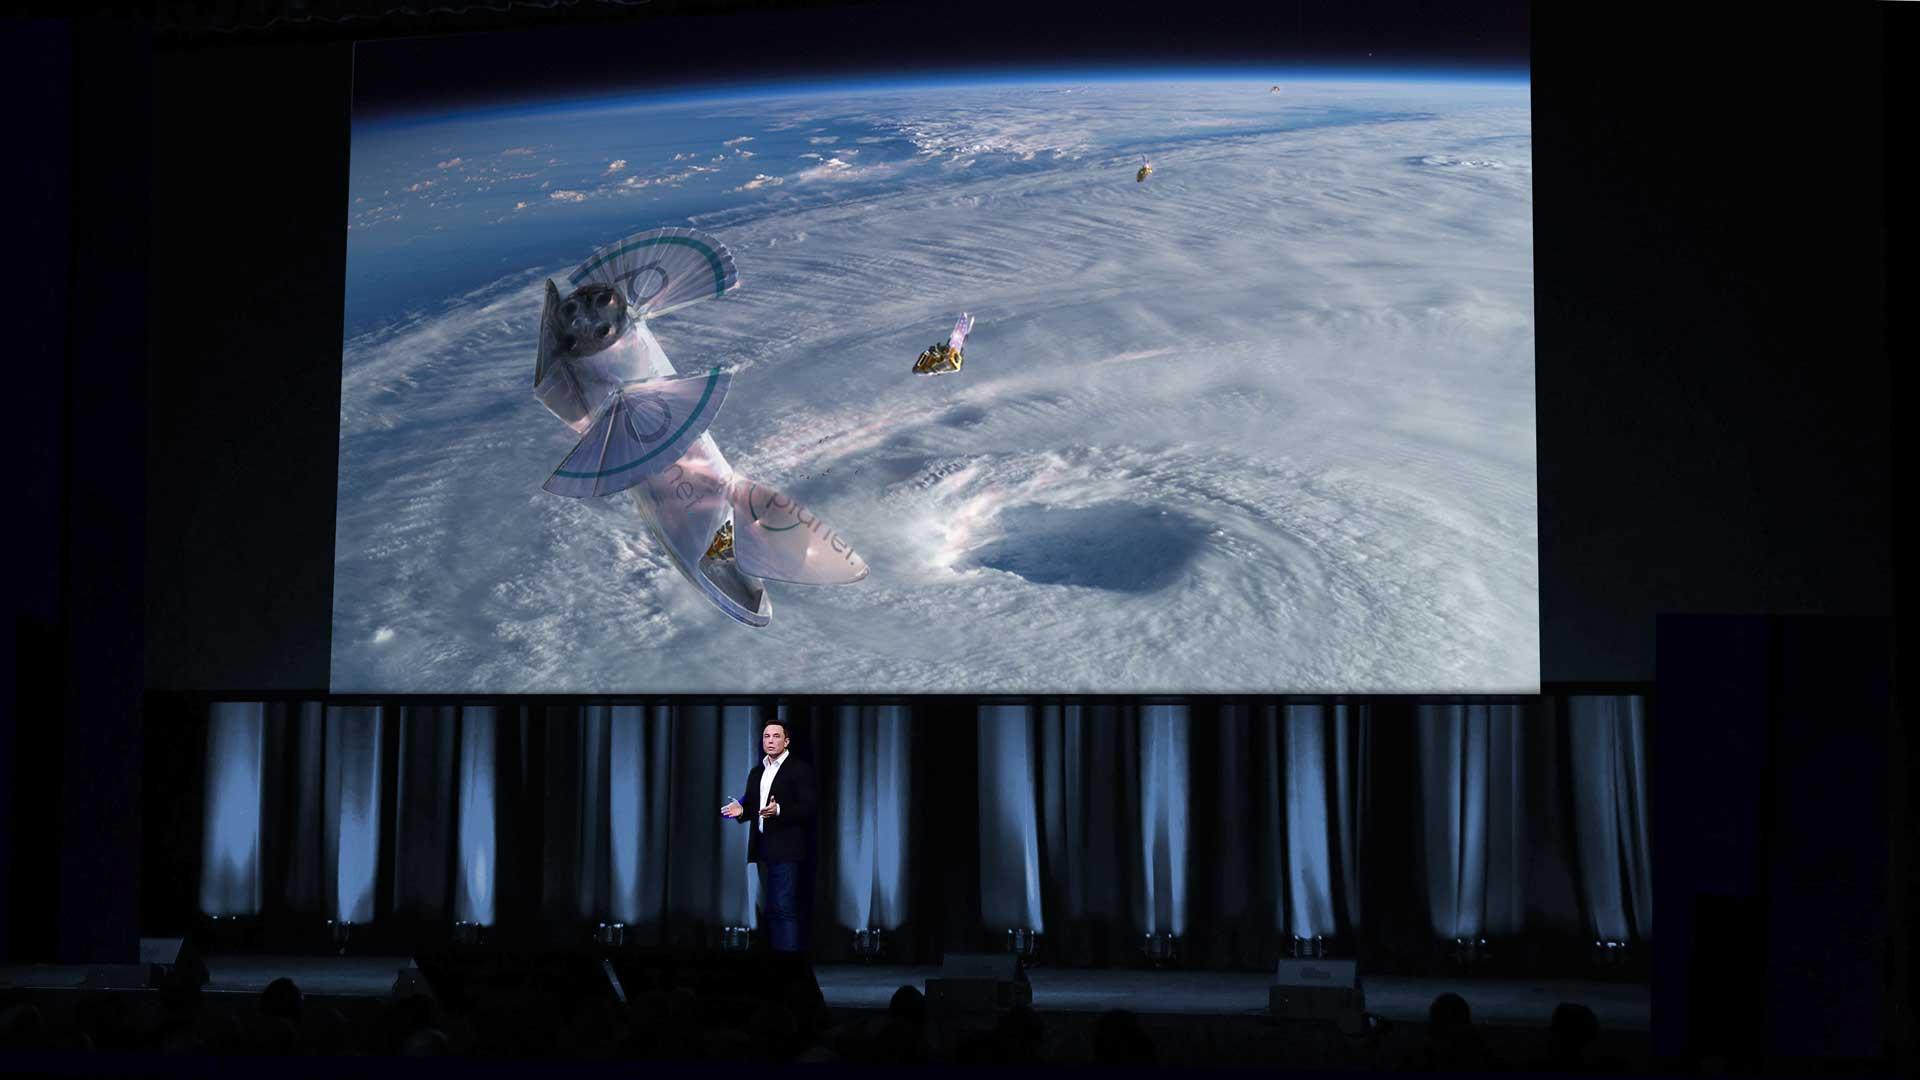 BFR_Planet_Condors_Musk_Presentation